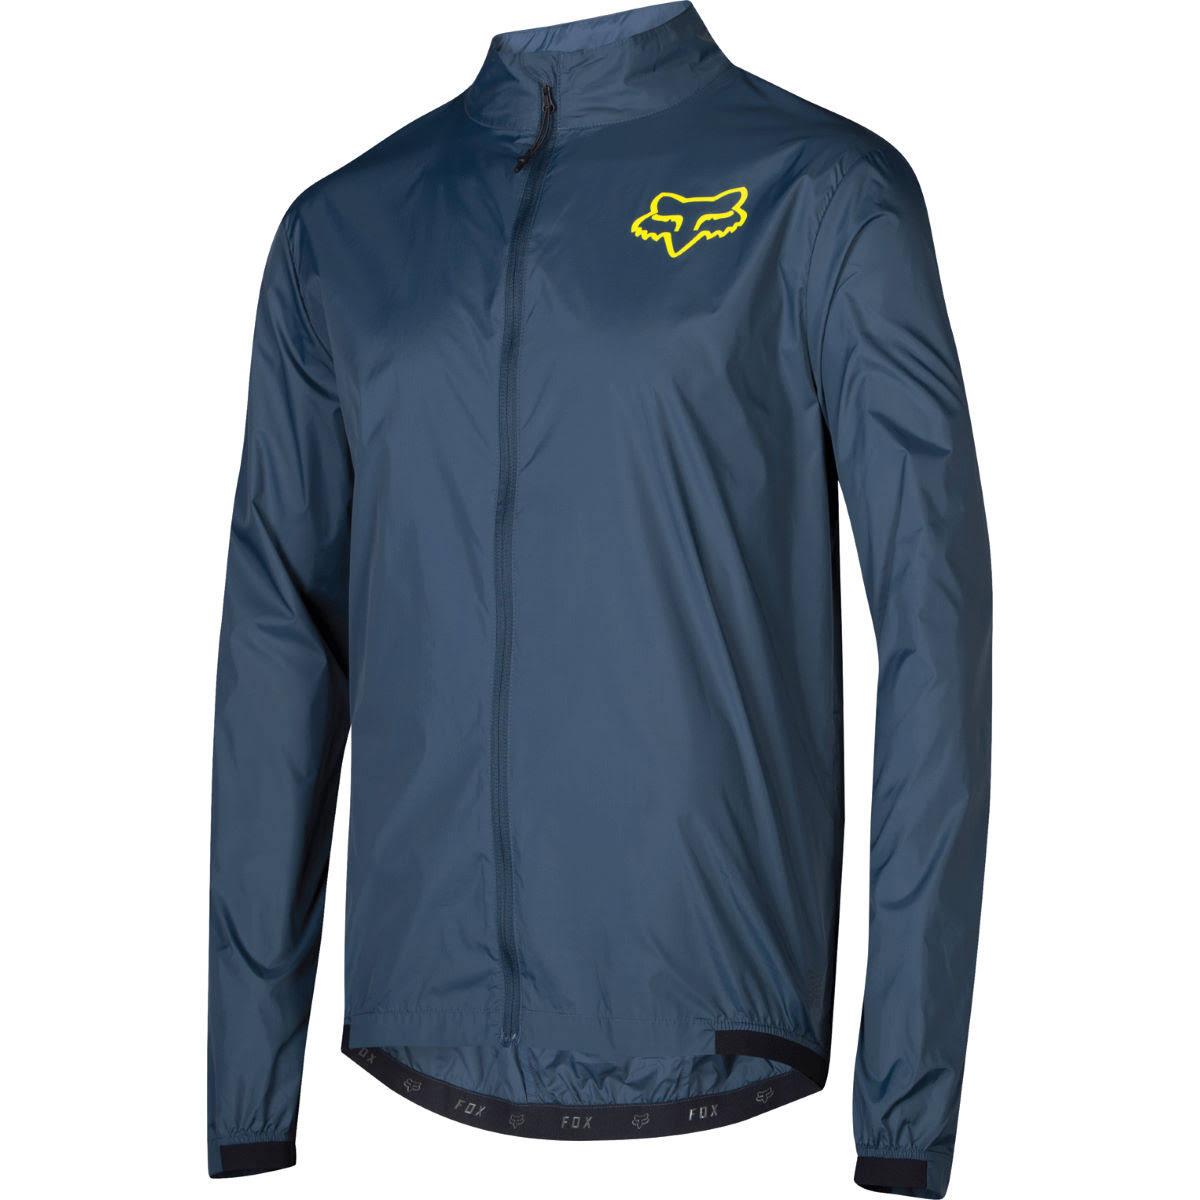 s Jacket Azul Racing Attack Medianoche Bike Fox Wind WAXpn